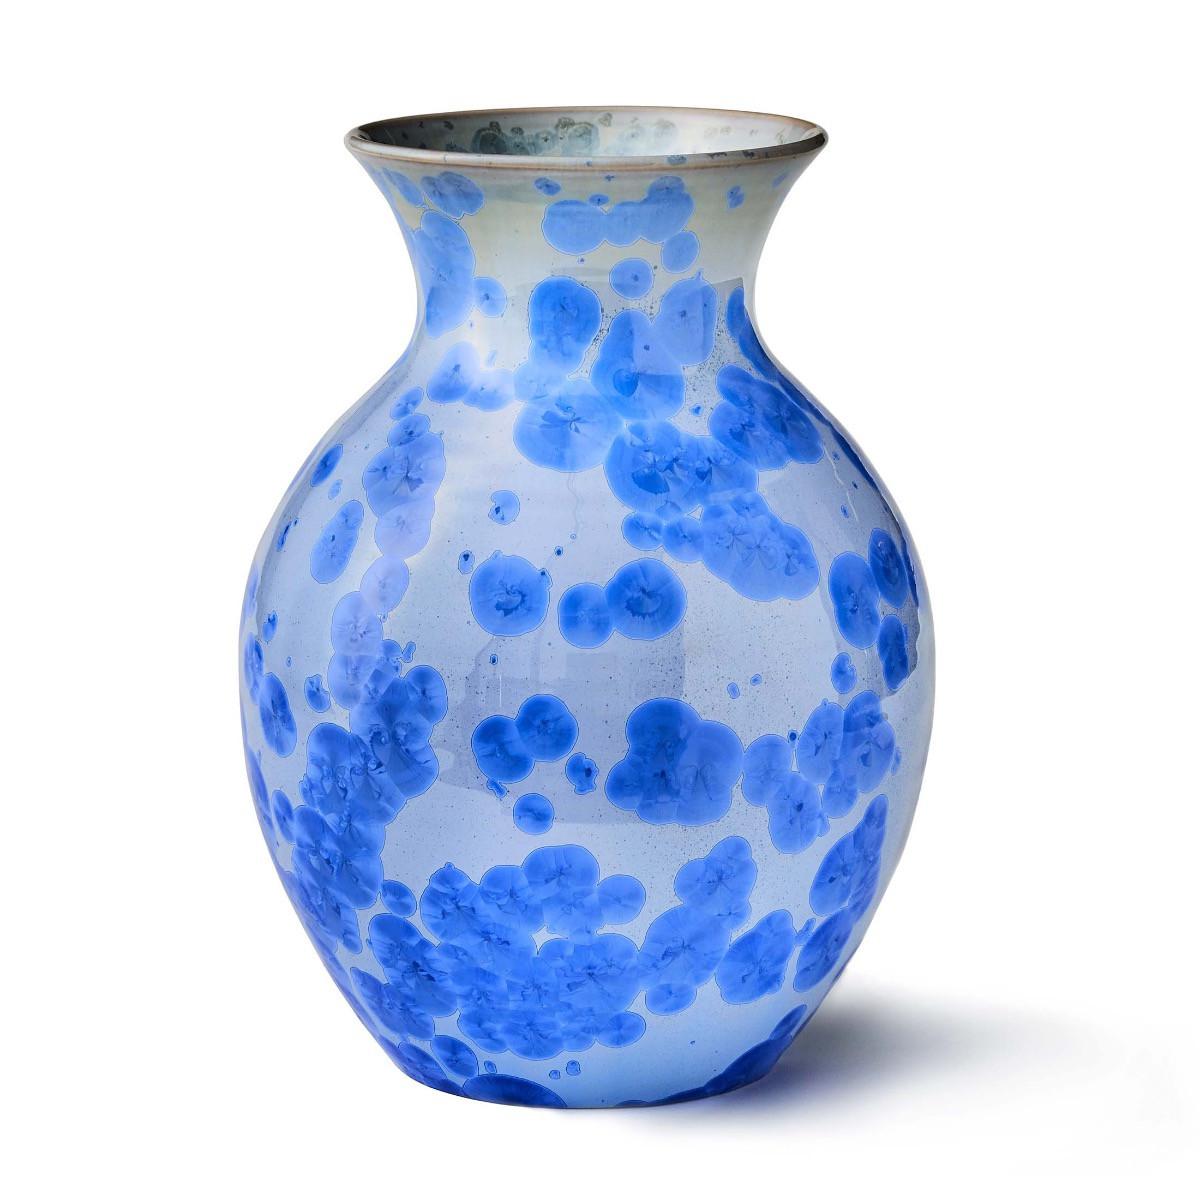 25 Ideal Simon Pearce Vase Sale 2021 free download simon pearce vase sale of curio cobalt crystalline vase large with 8543 curiocrystalline vase cobalt